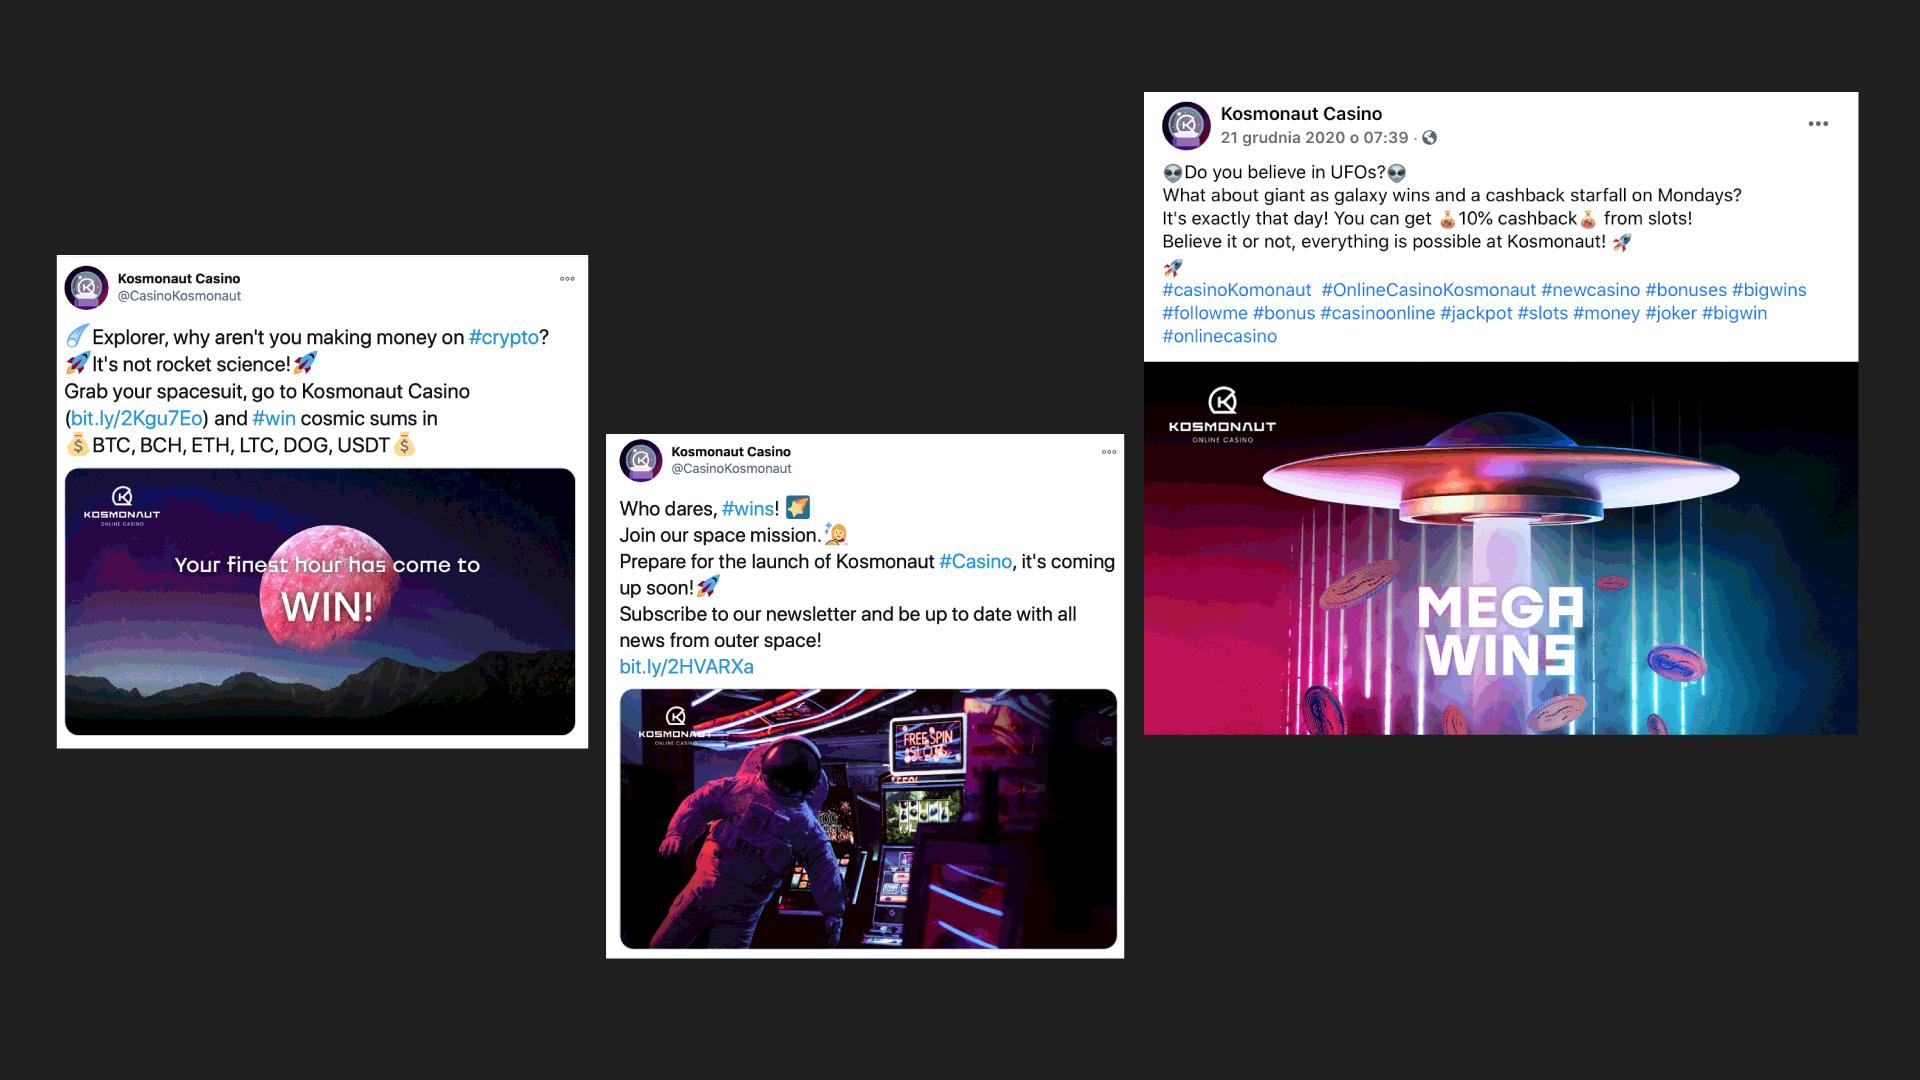 Kosmonaut Online Casino social media posts